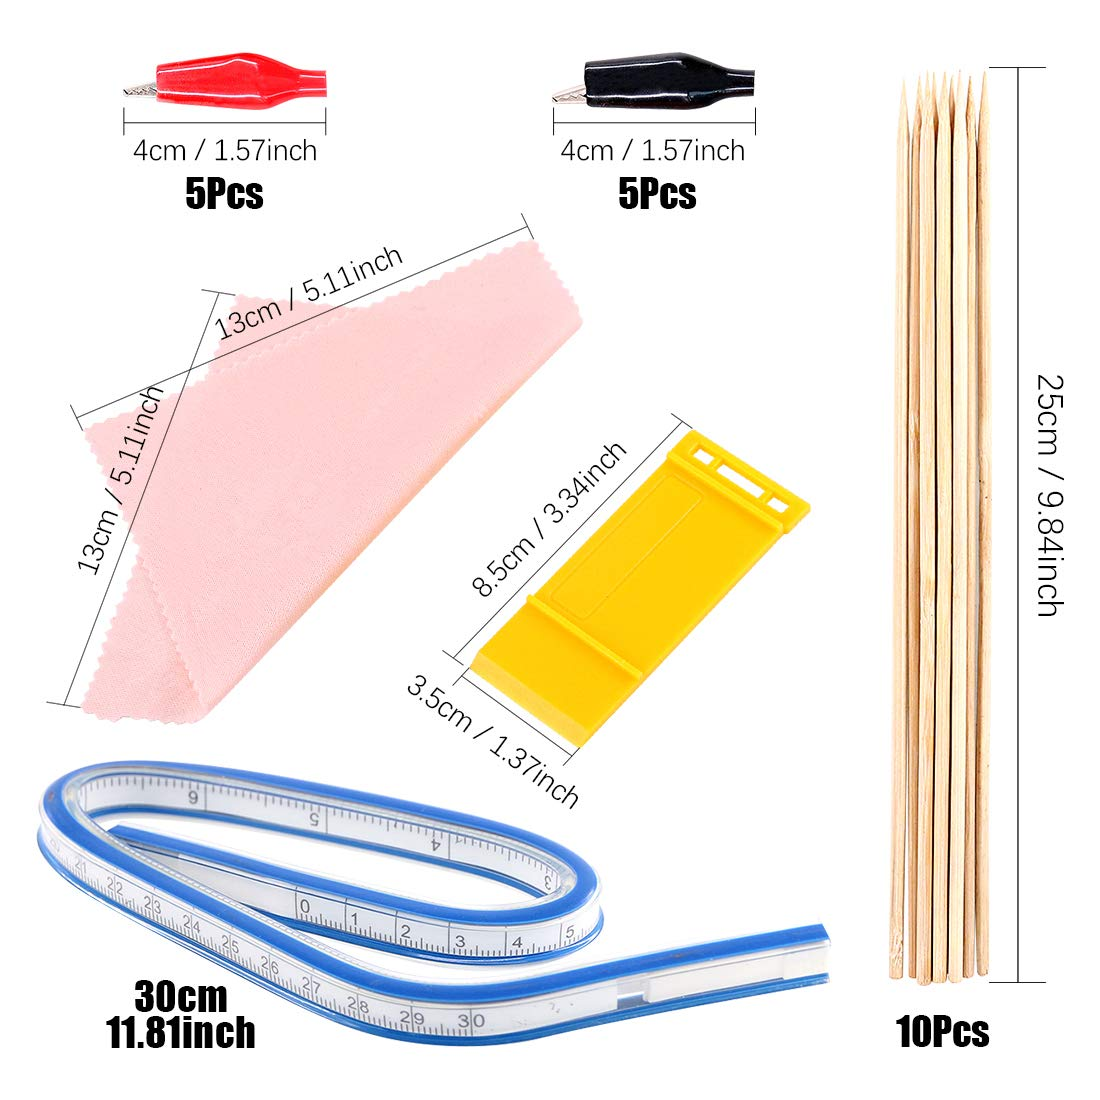 Keadic 87Pcs Modeler Basic Tools Craft Set Gundam Model Tools Kit with Plastic Box and Waterproof Bag for Gundam Car Model Building (Kit 10) by Keadic (Image #5)